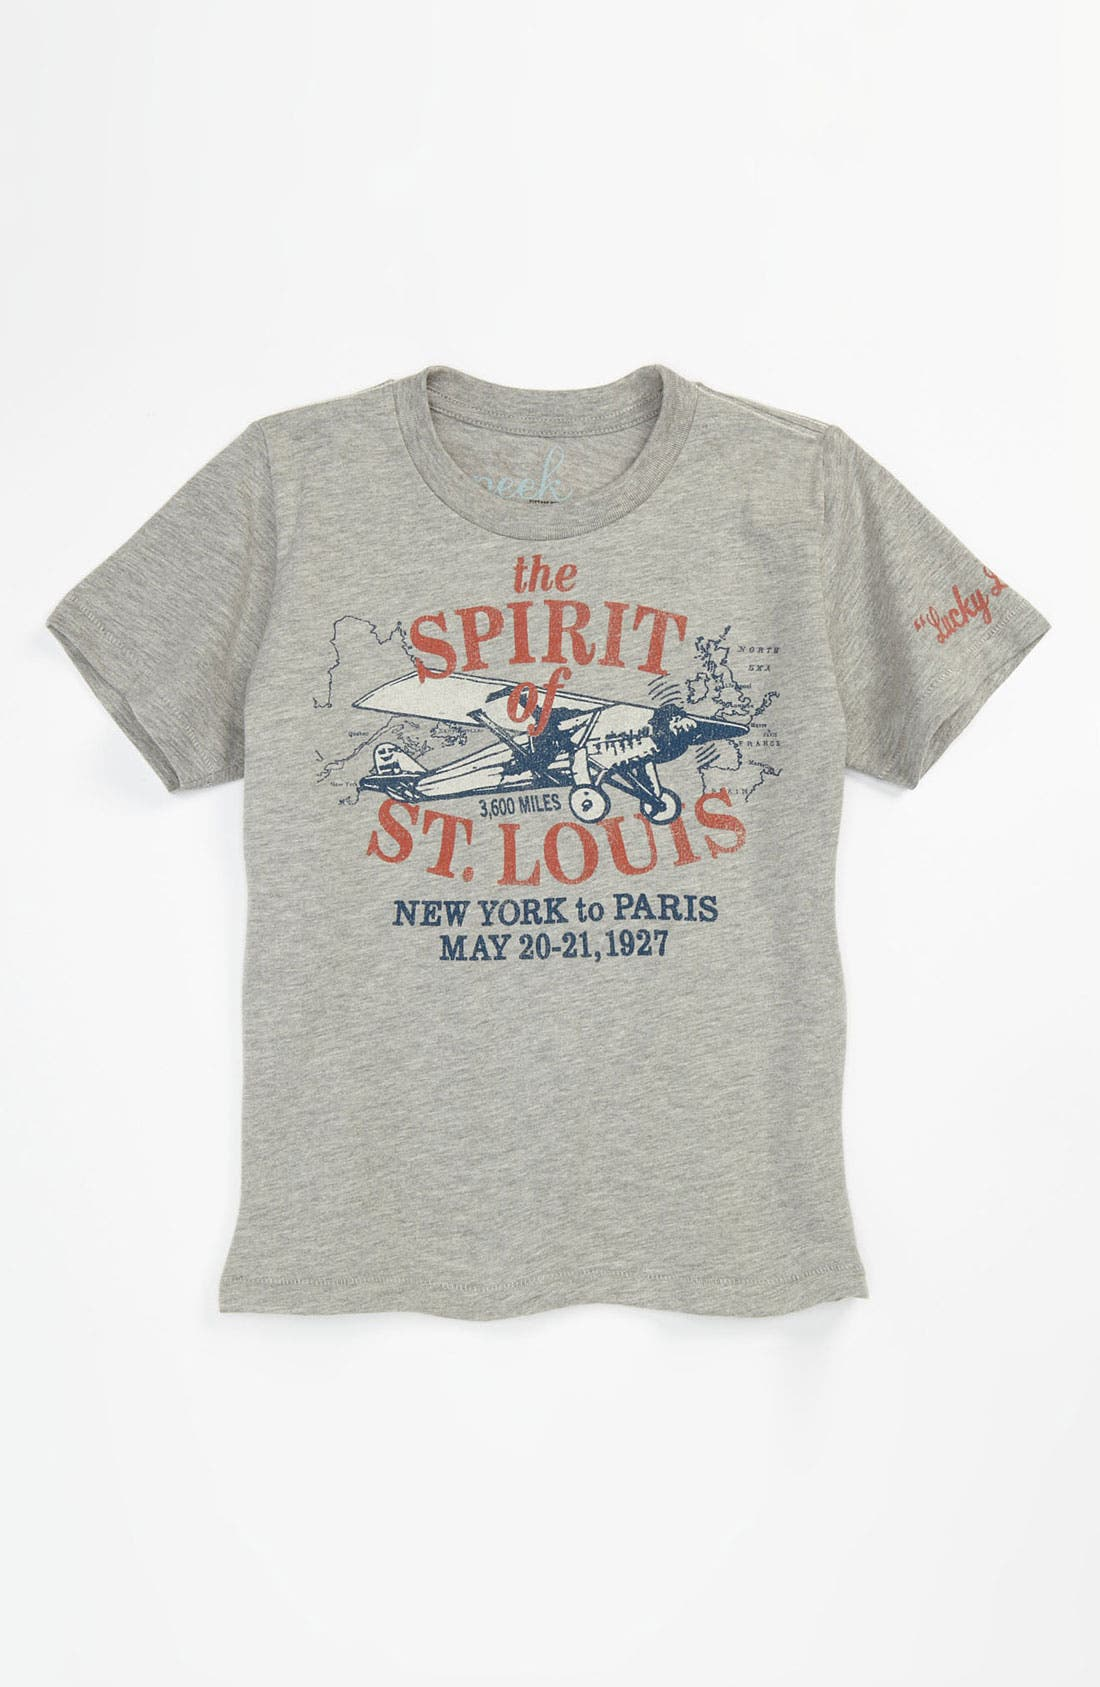 Alternate Image 1 Selected - Peek 'Spirit of St. Louis' T-Shirt (Toddler, Little Boys & Big Boys)